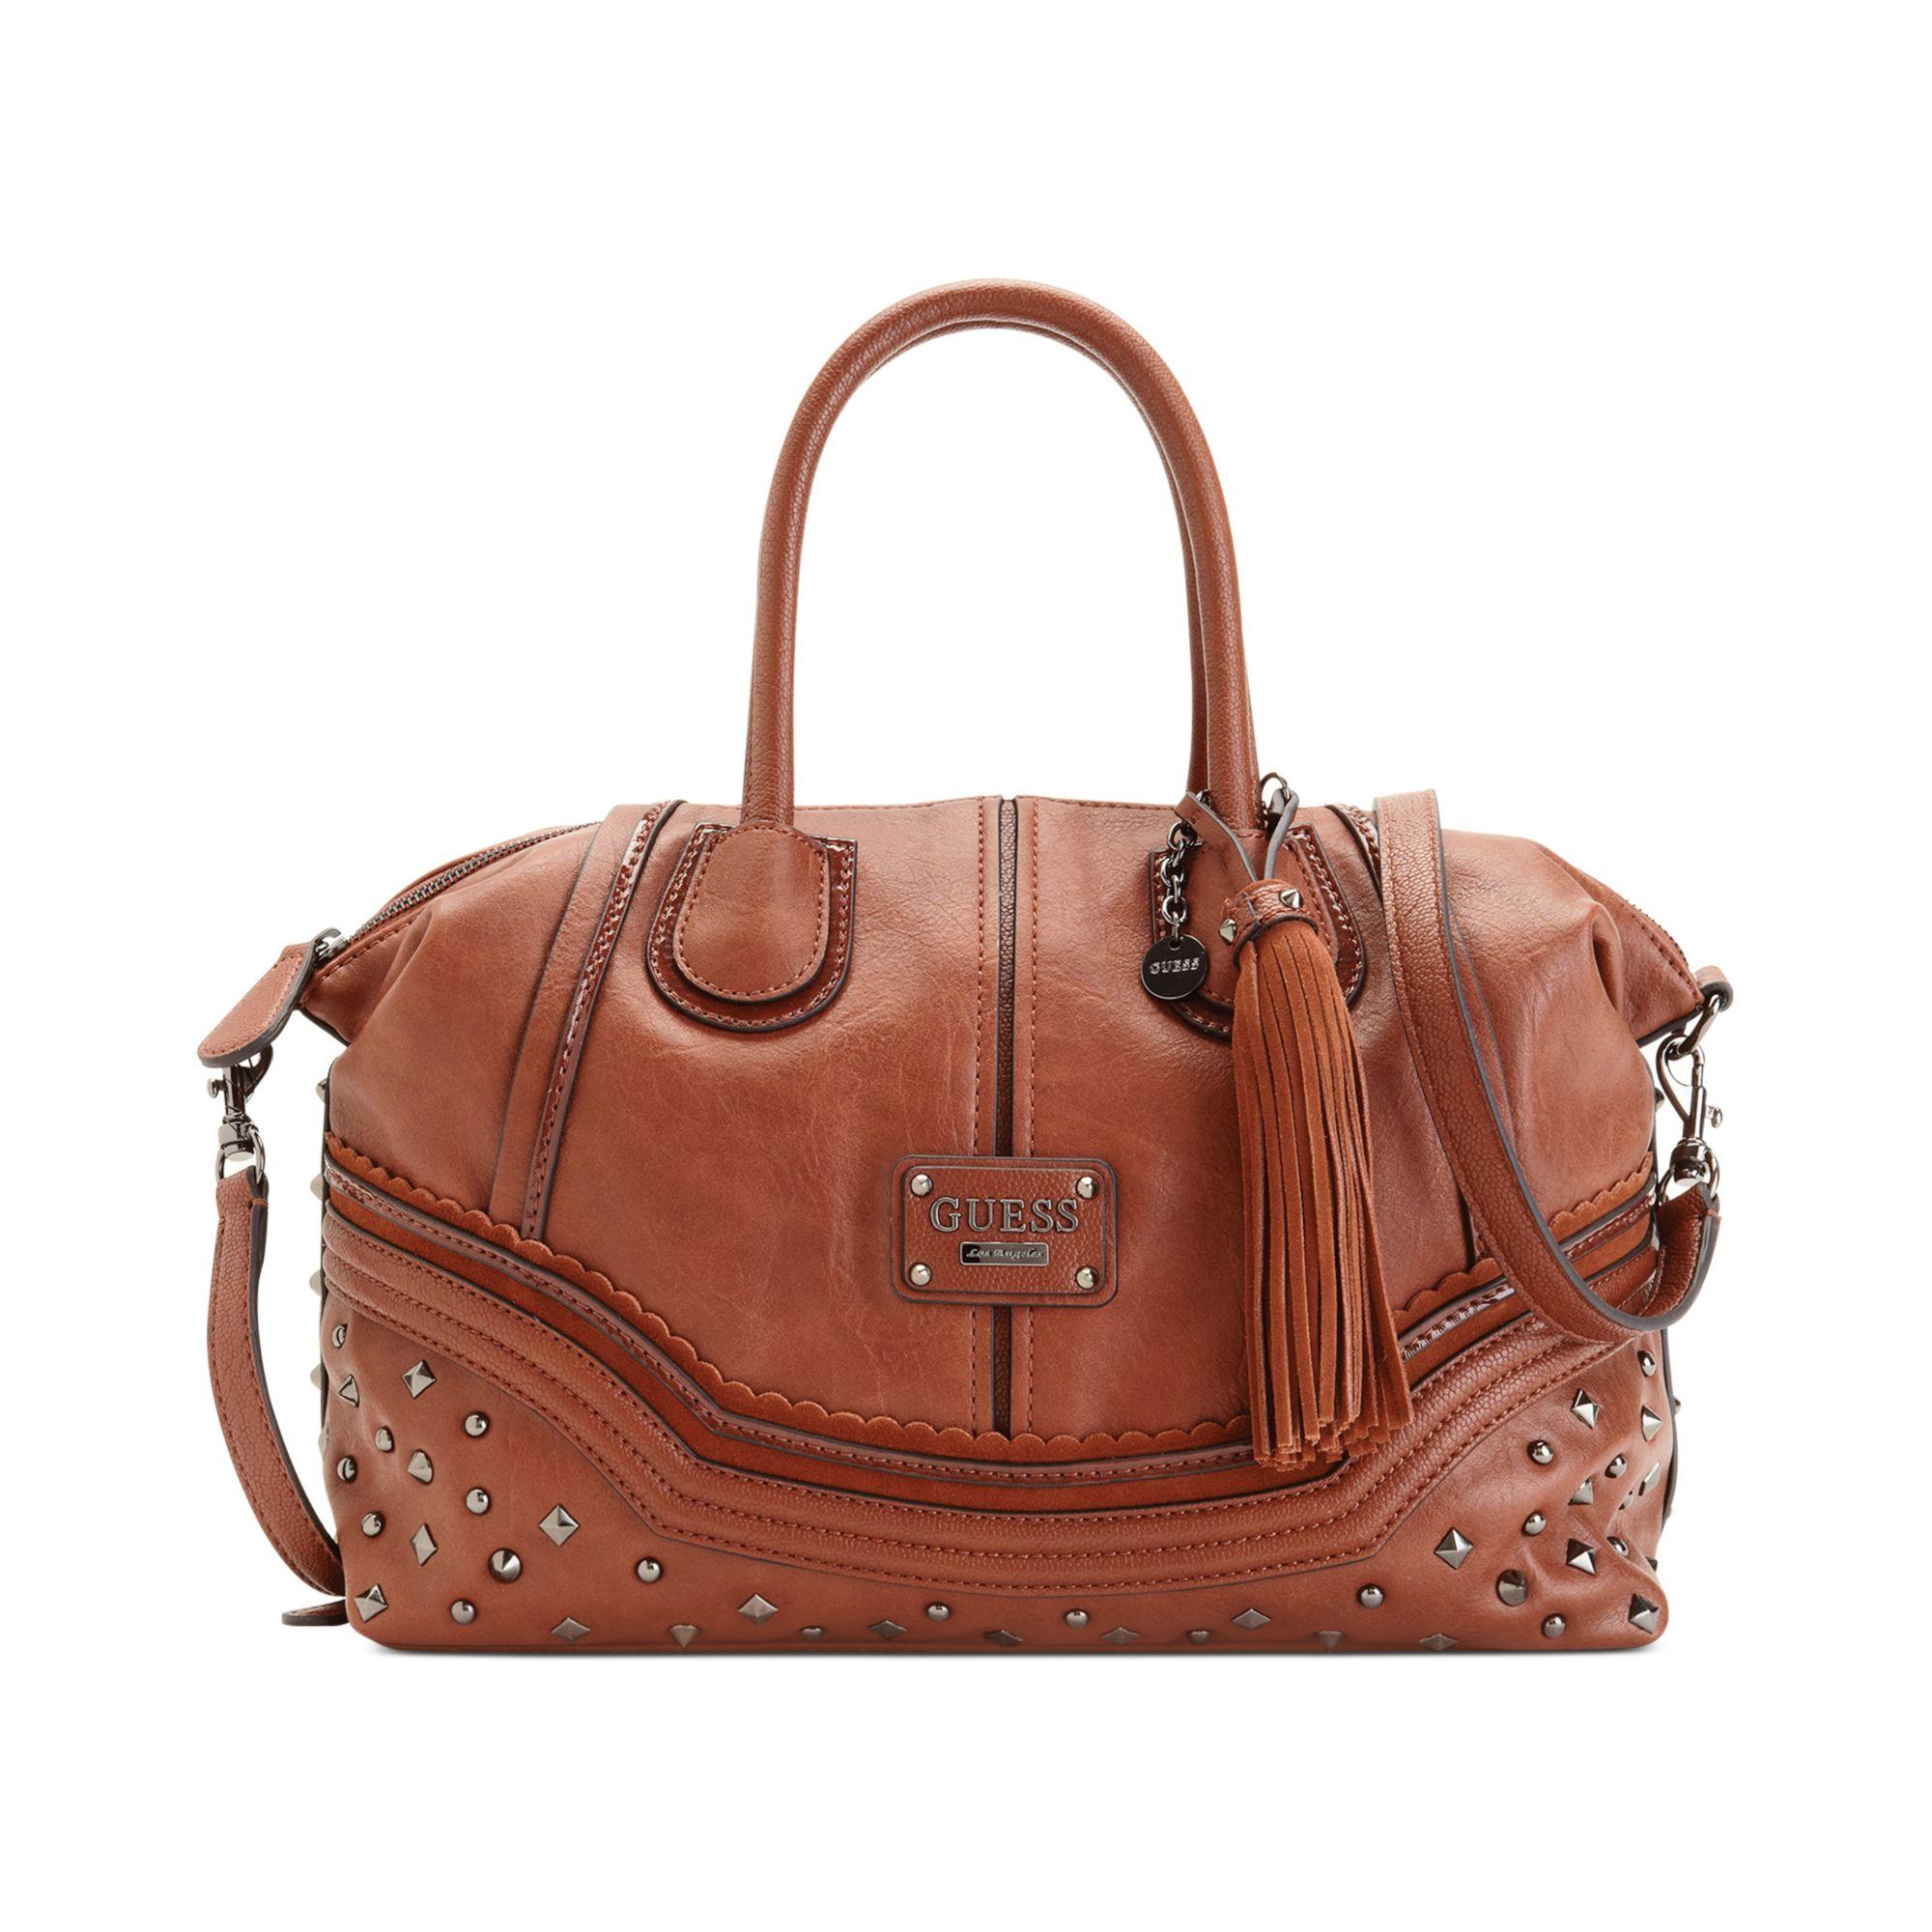 Guess Brown Handbag - Handbag Photos Eleventyone.Org d36dbe370d2ed